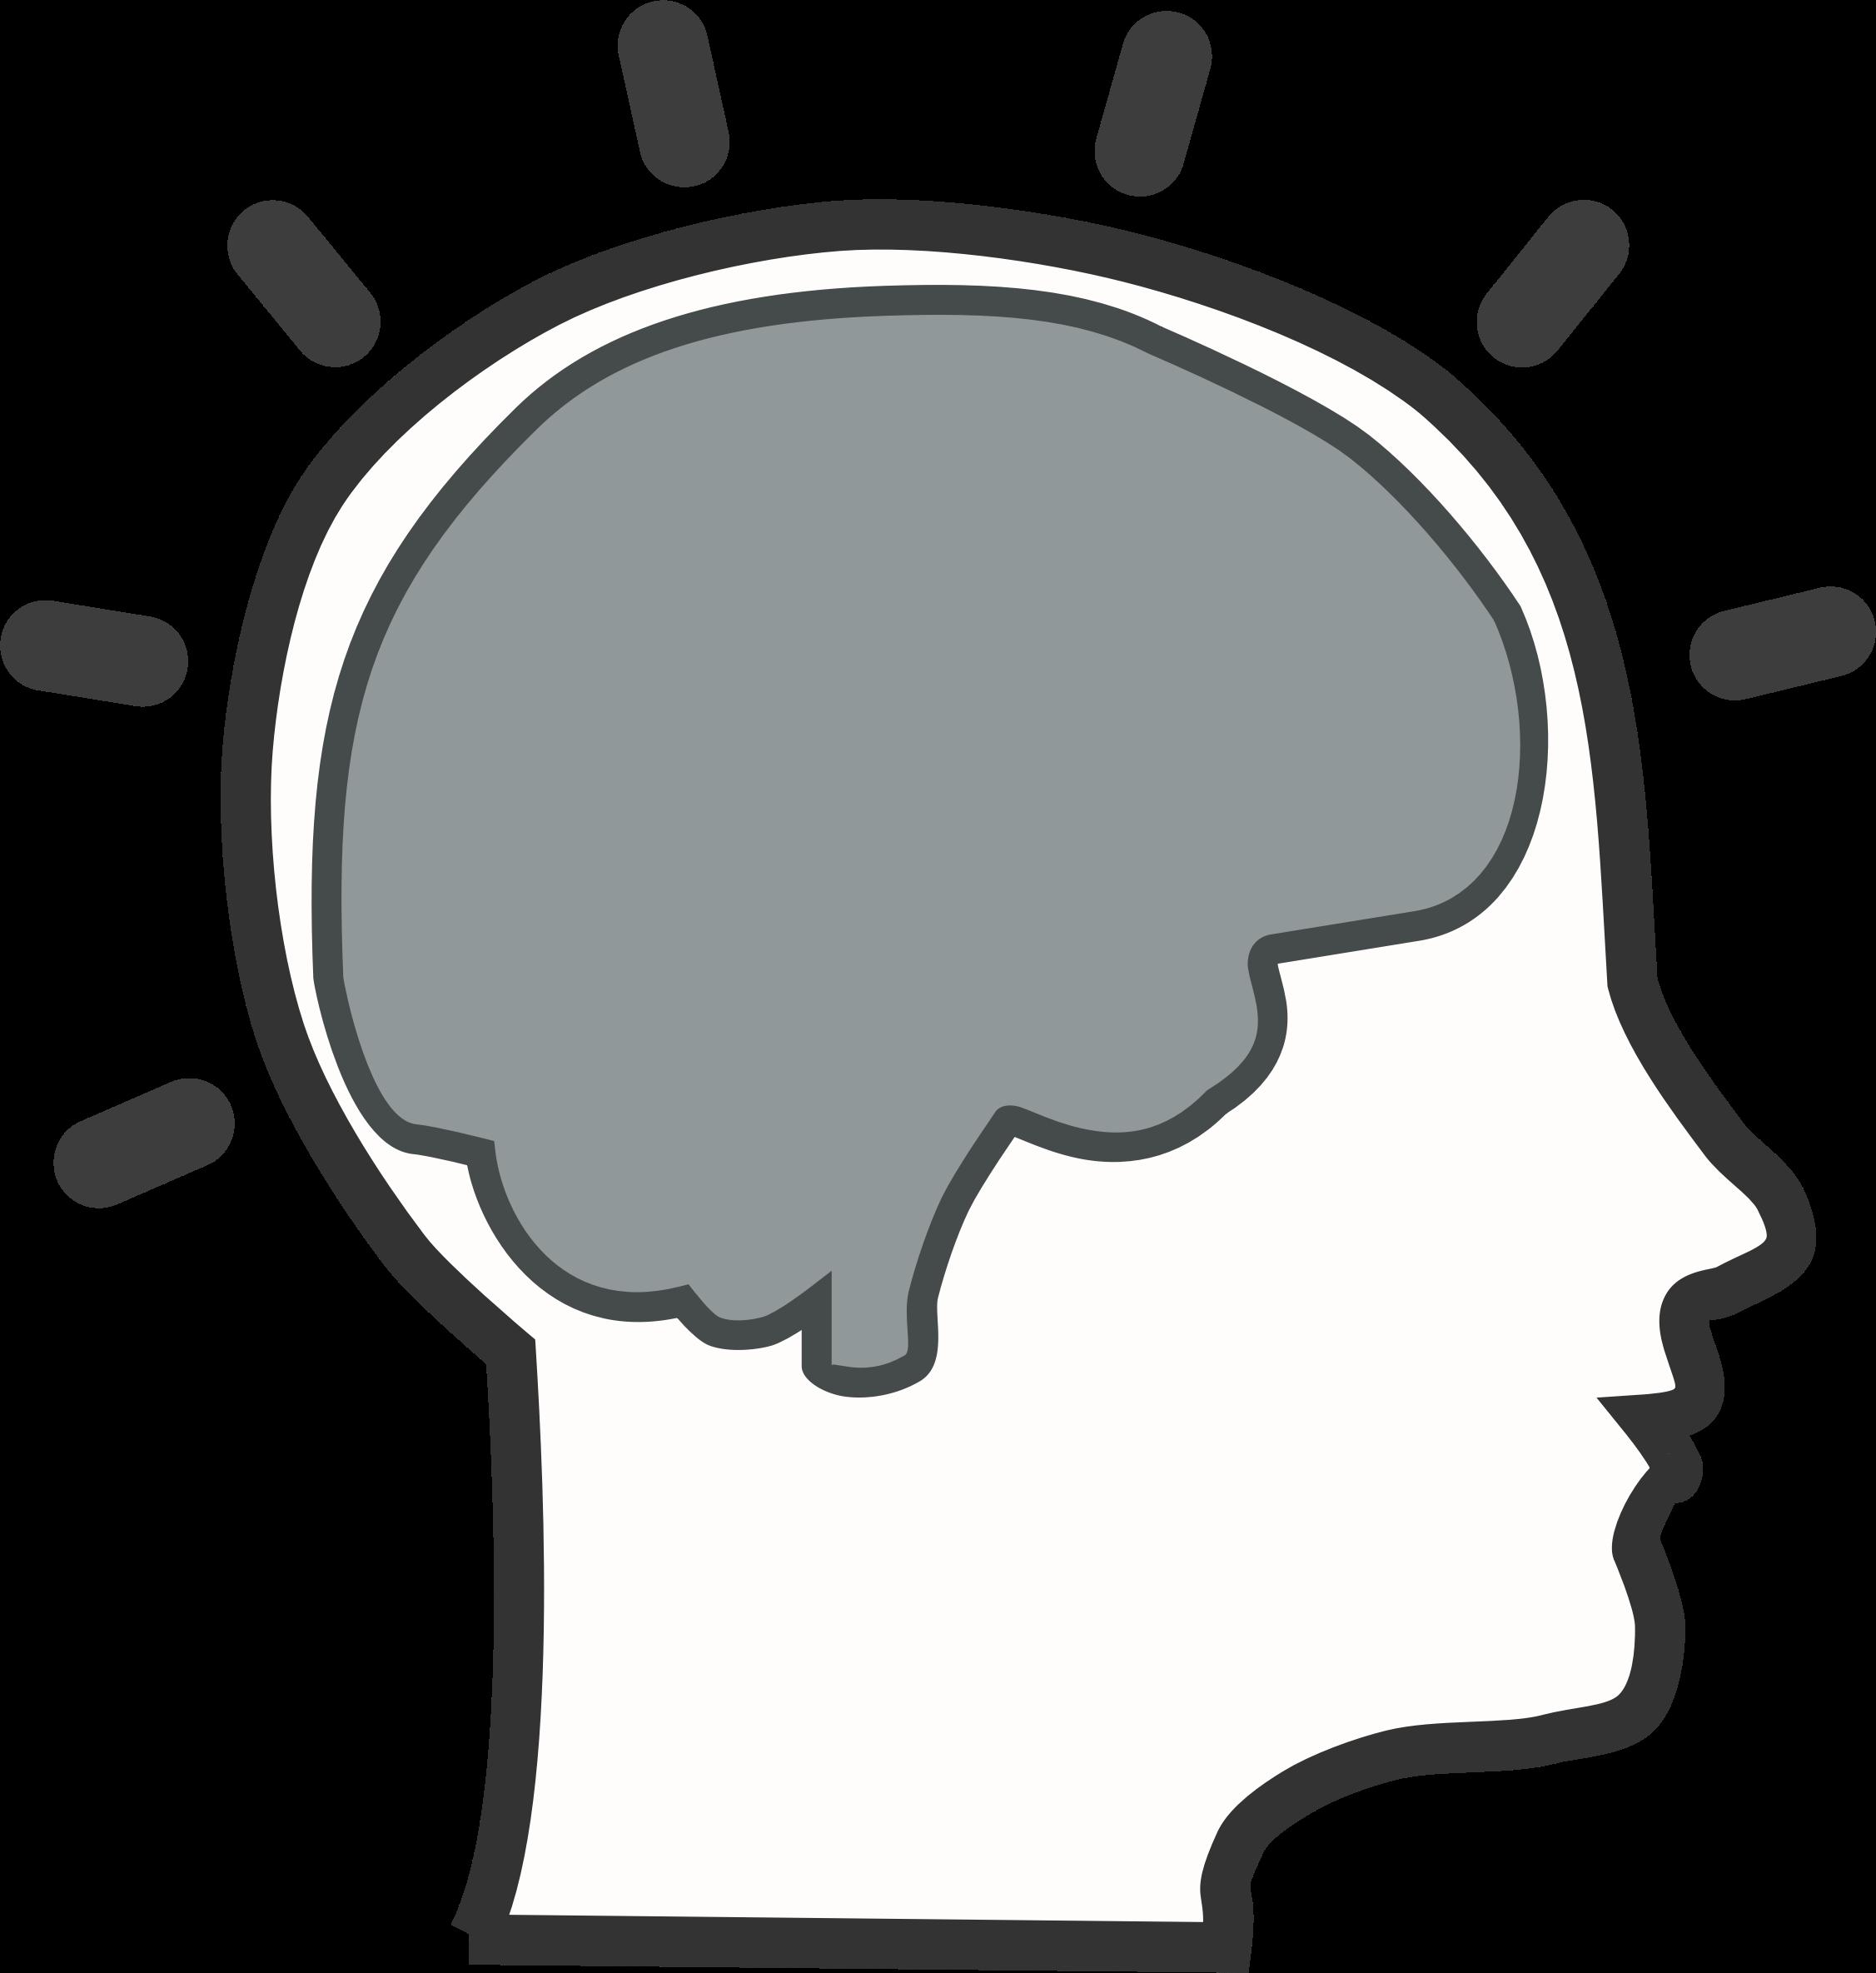 2253x2369 Brain Clipart Etc 2 Clipartix